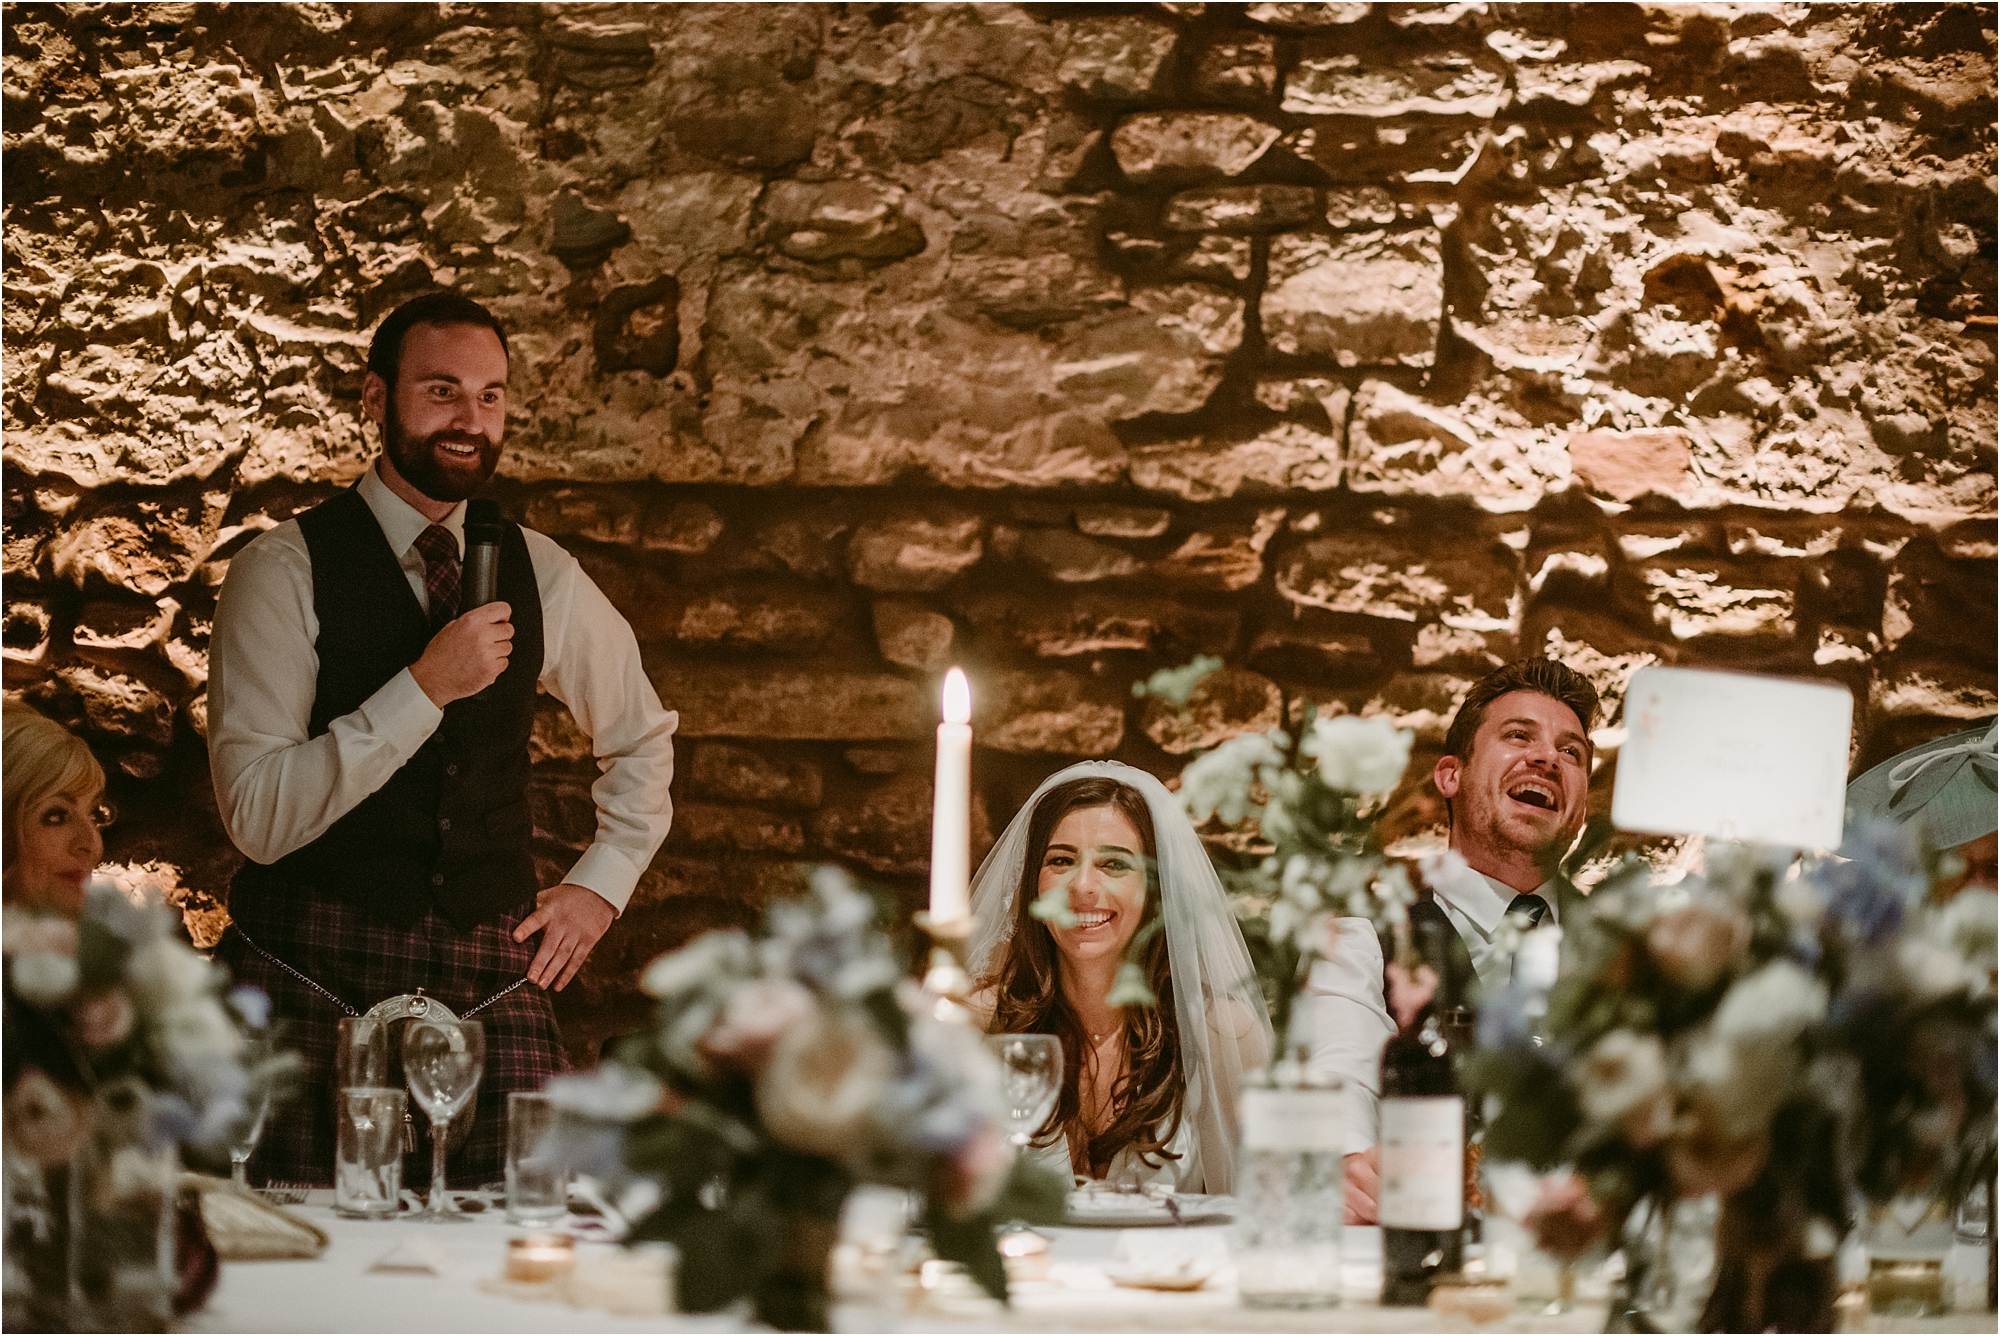 Scott+Joanna-Kinkell-Byre-wedding-fife-photography__0090.jpg